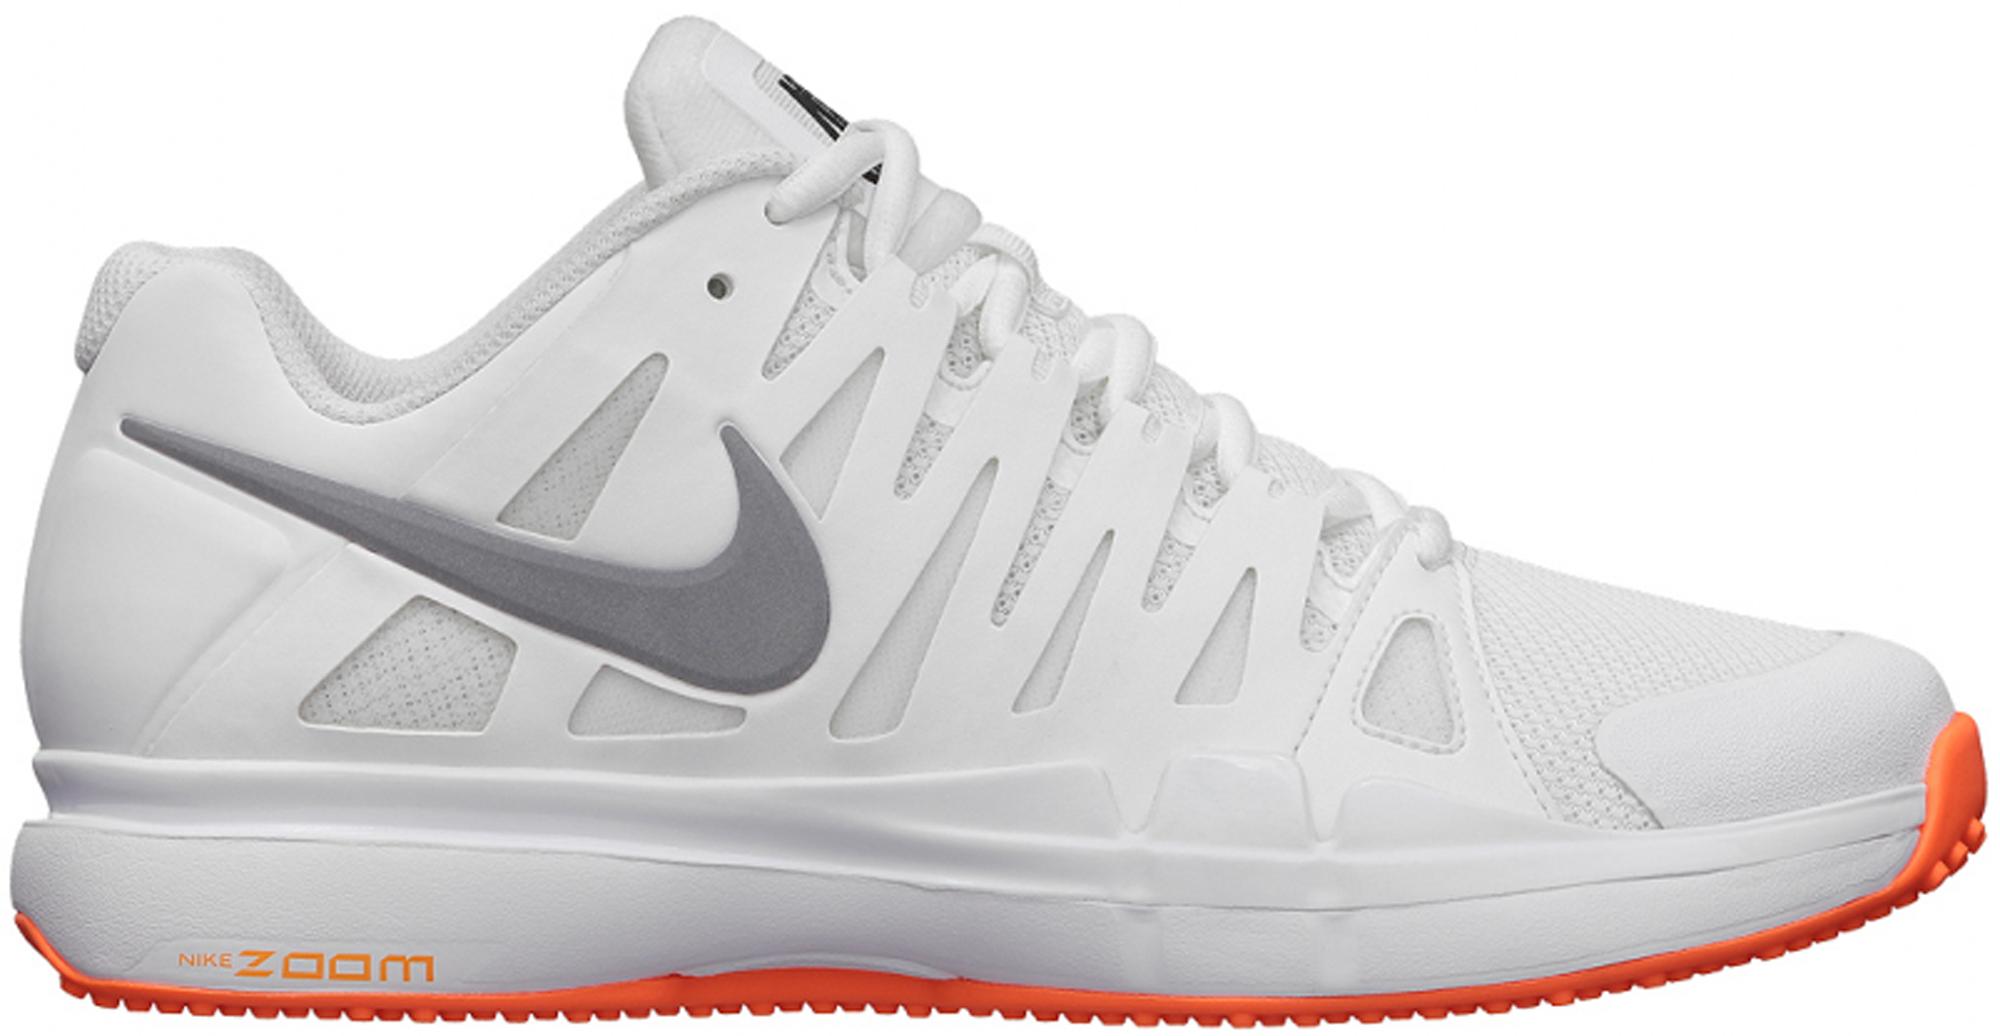 Nike Zoom Vapor 9 Tour Grass - Sneakers